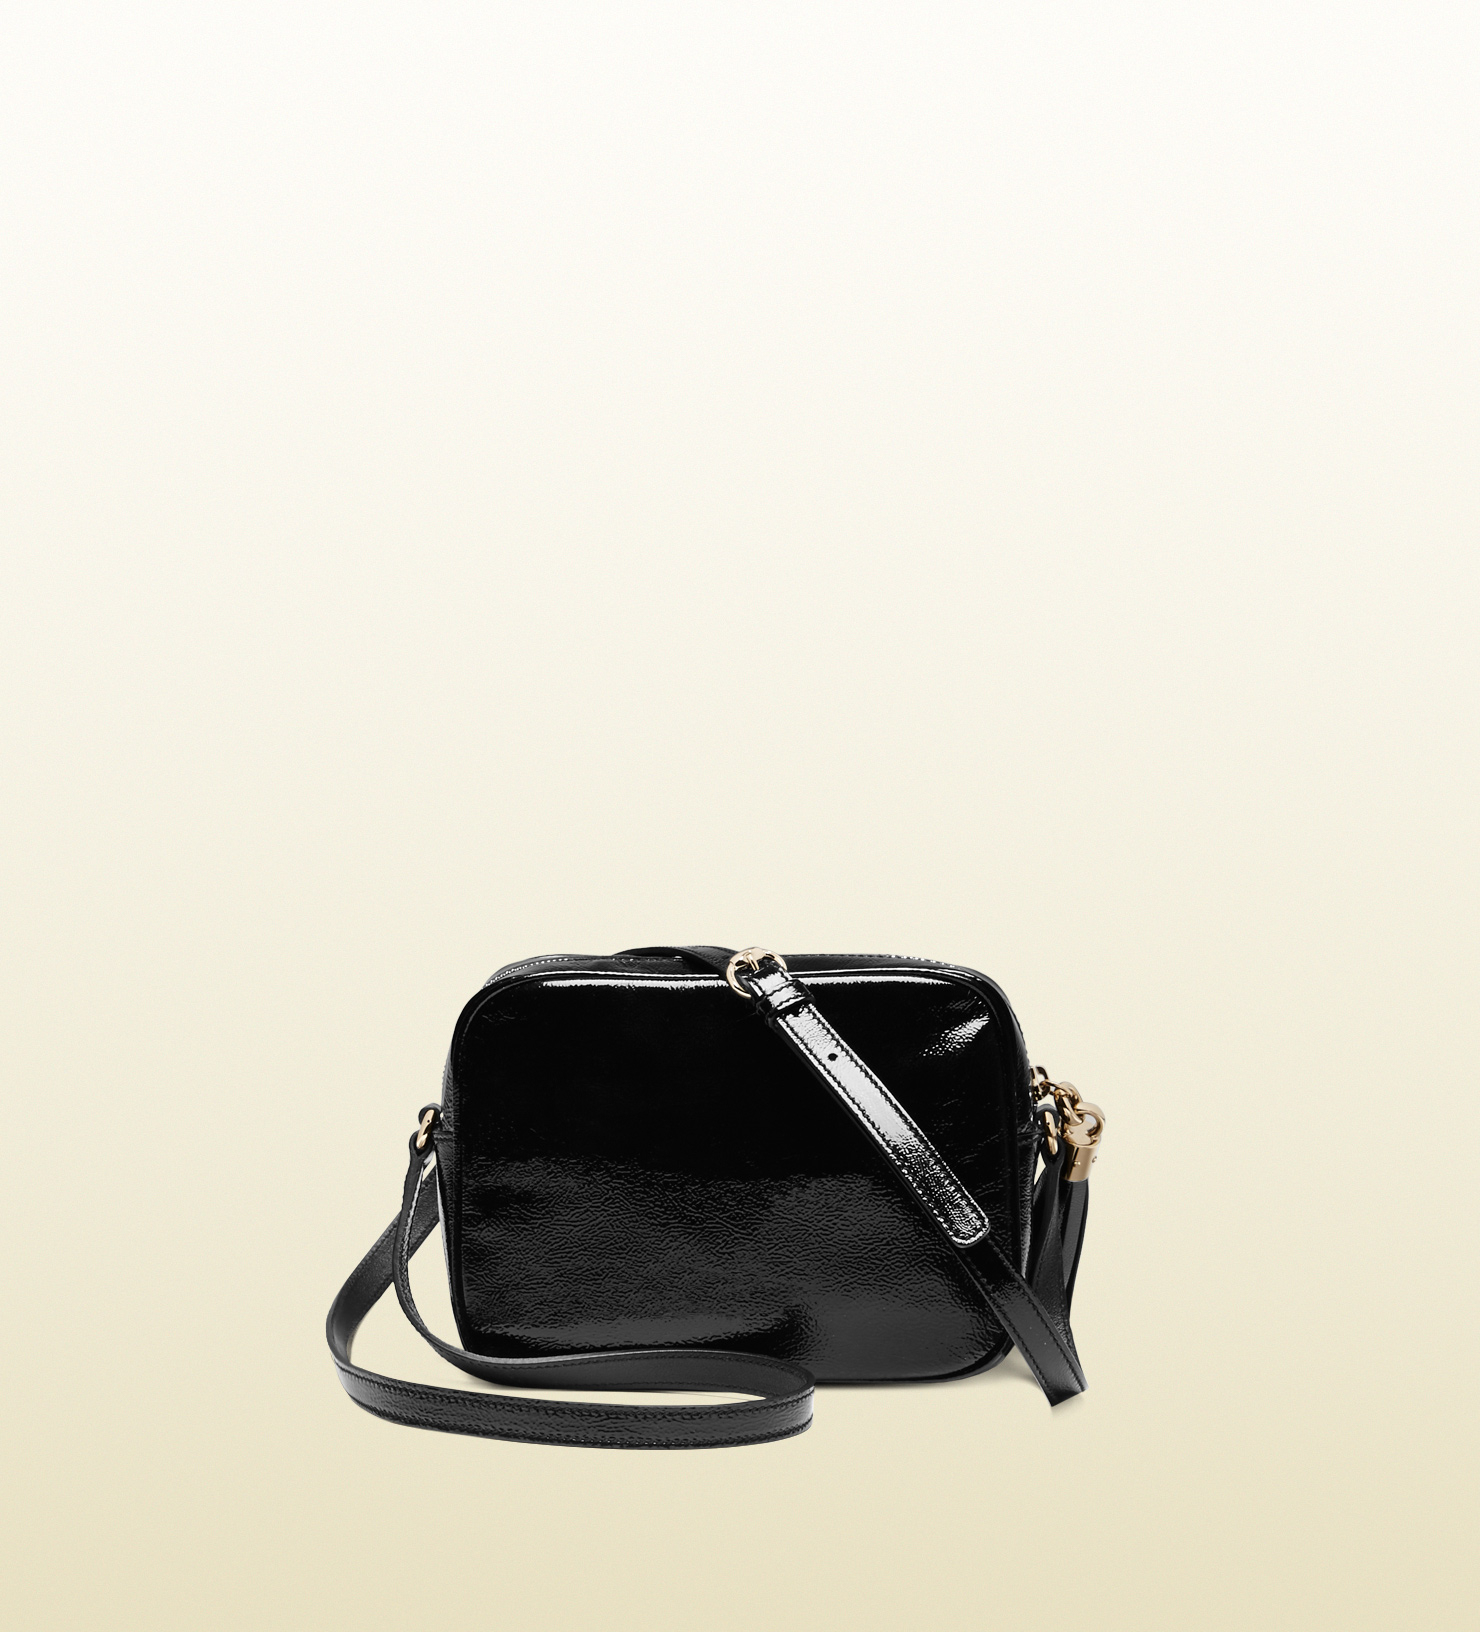 Lyst - Gucci Soho Soft Patent Leather Disco Bag in Black 5a5d2b7f9a899